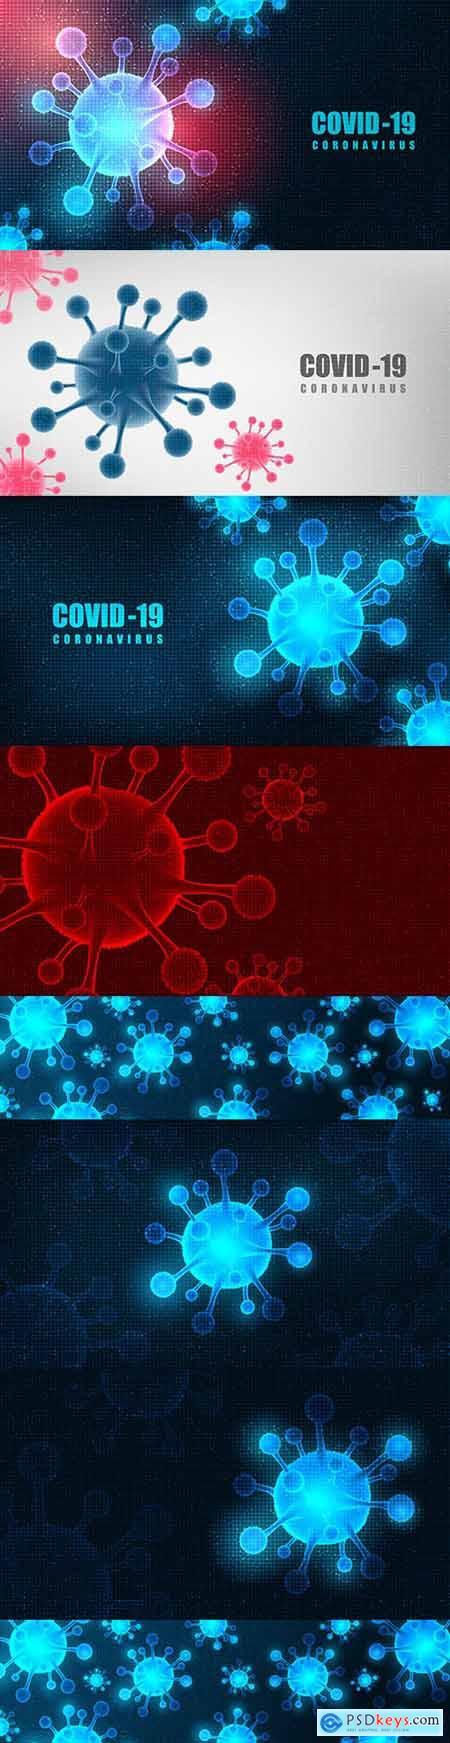 Coronavirus futuristic background concept health care and microbiology